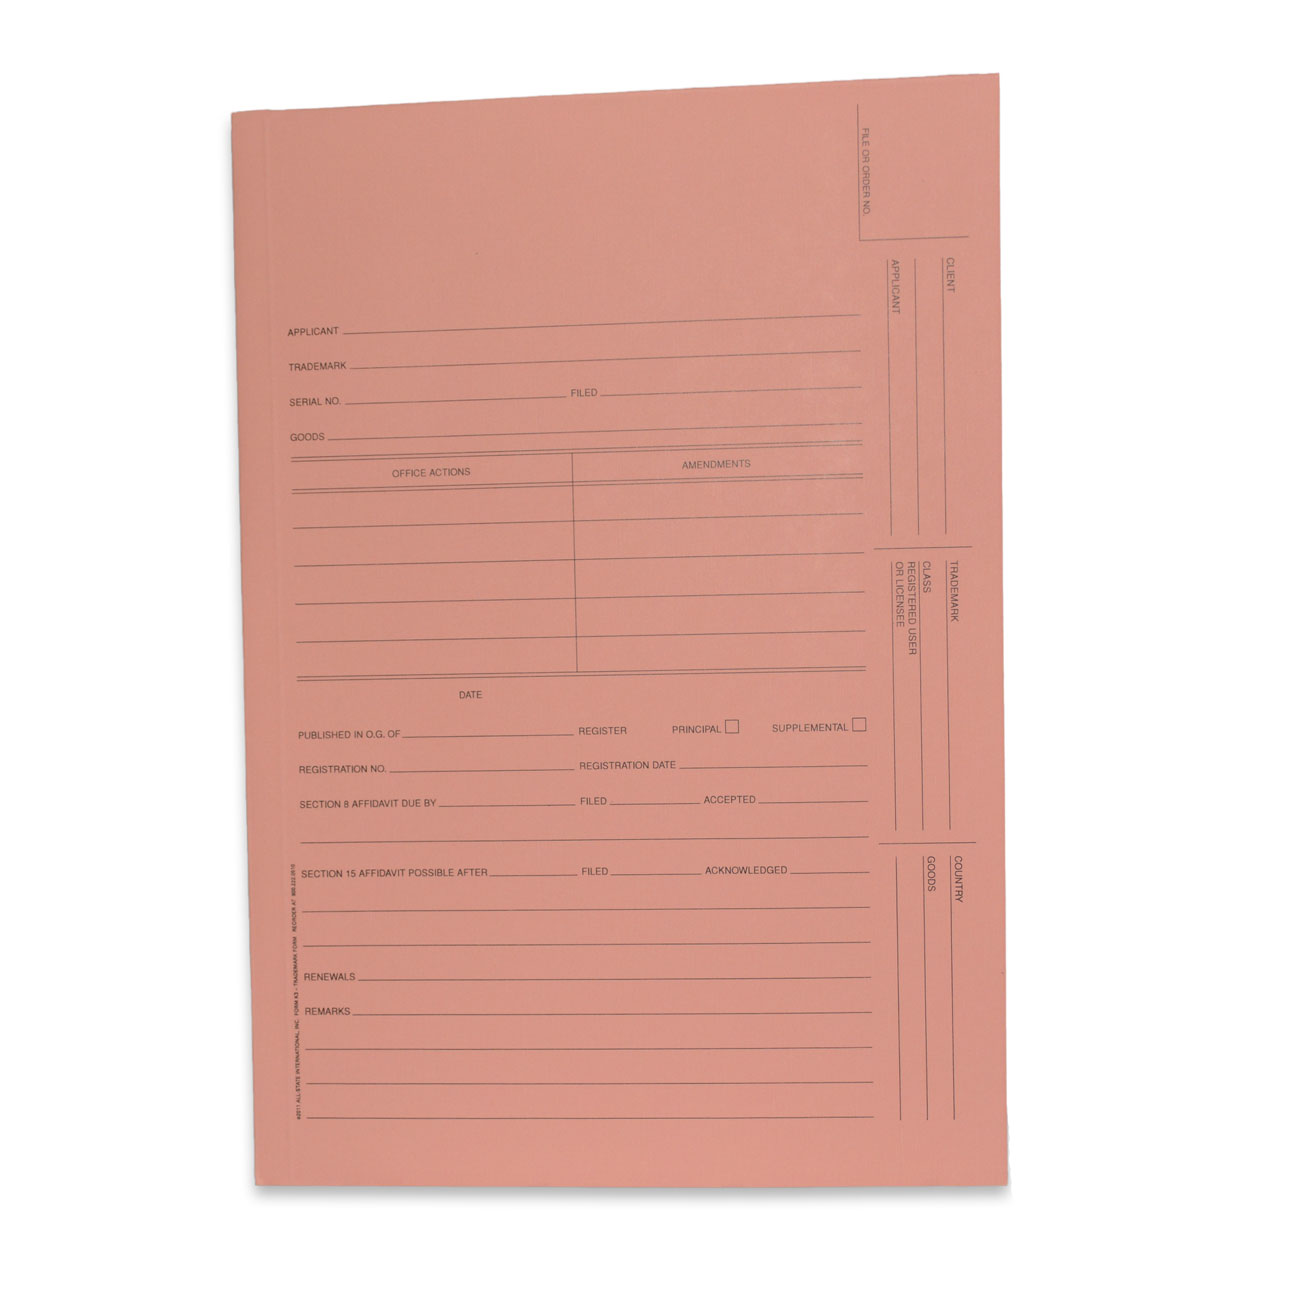 Intellectual Property Folders, Trademark Application